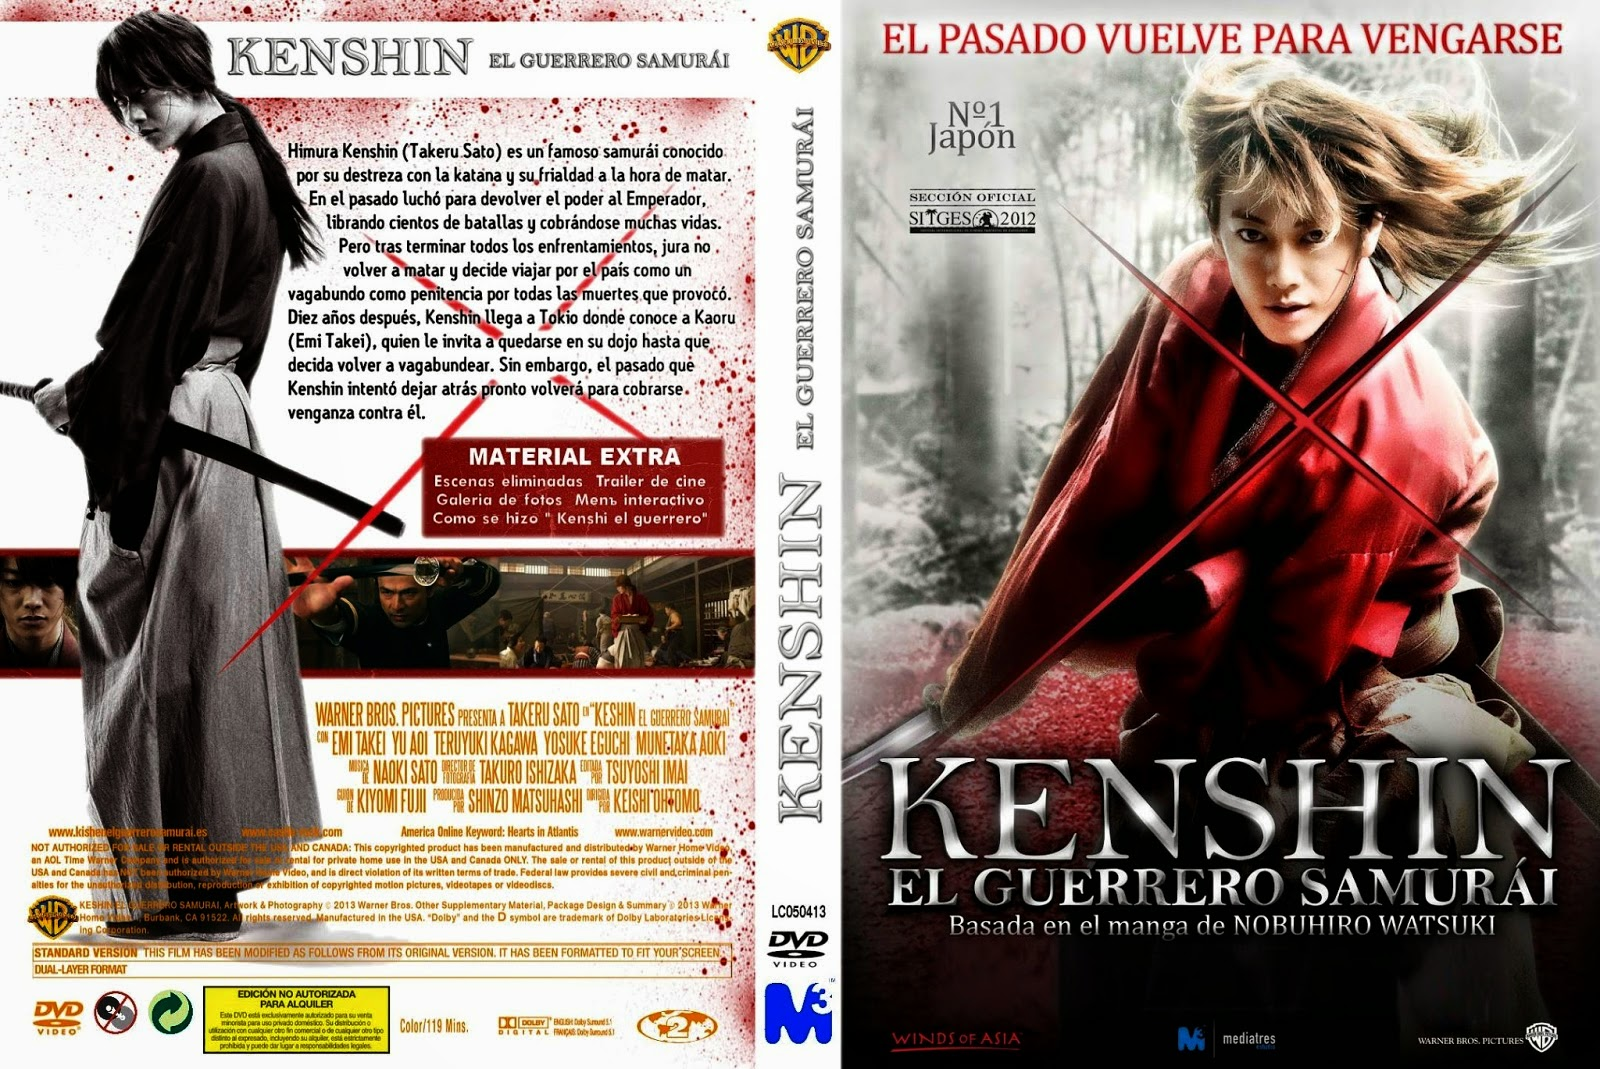 Kenshin el Guerrero Samurai DVD